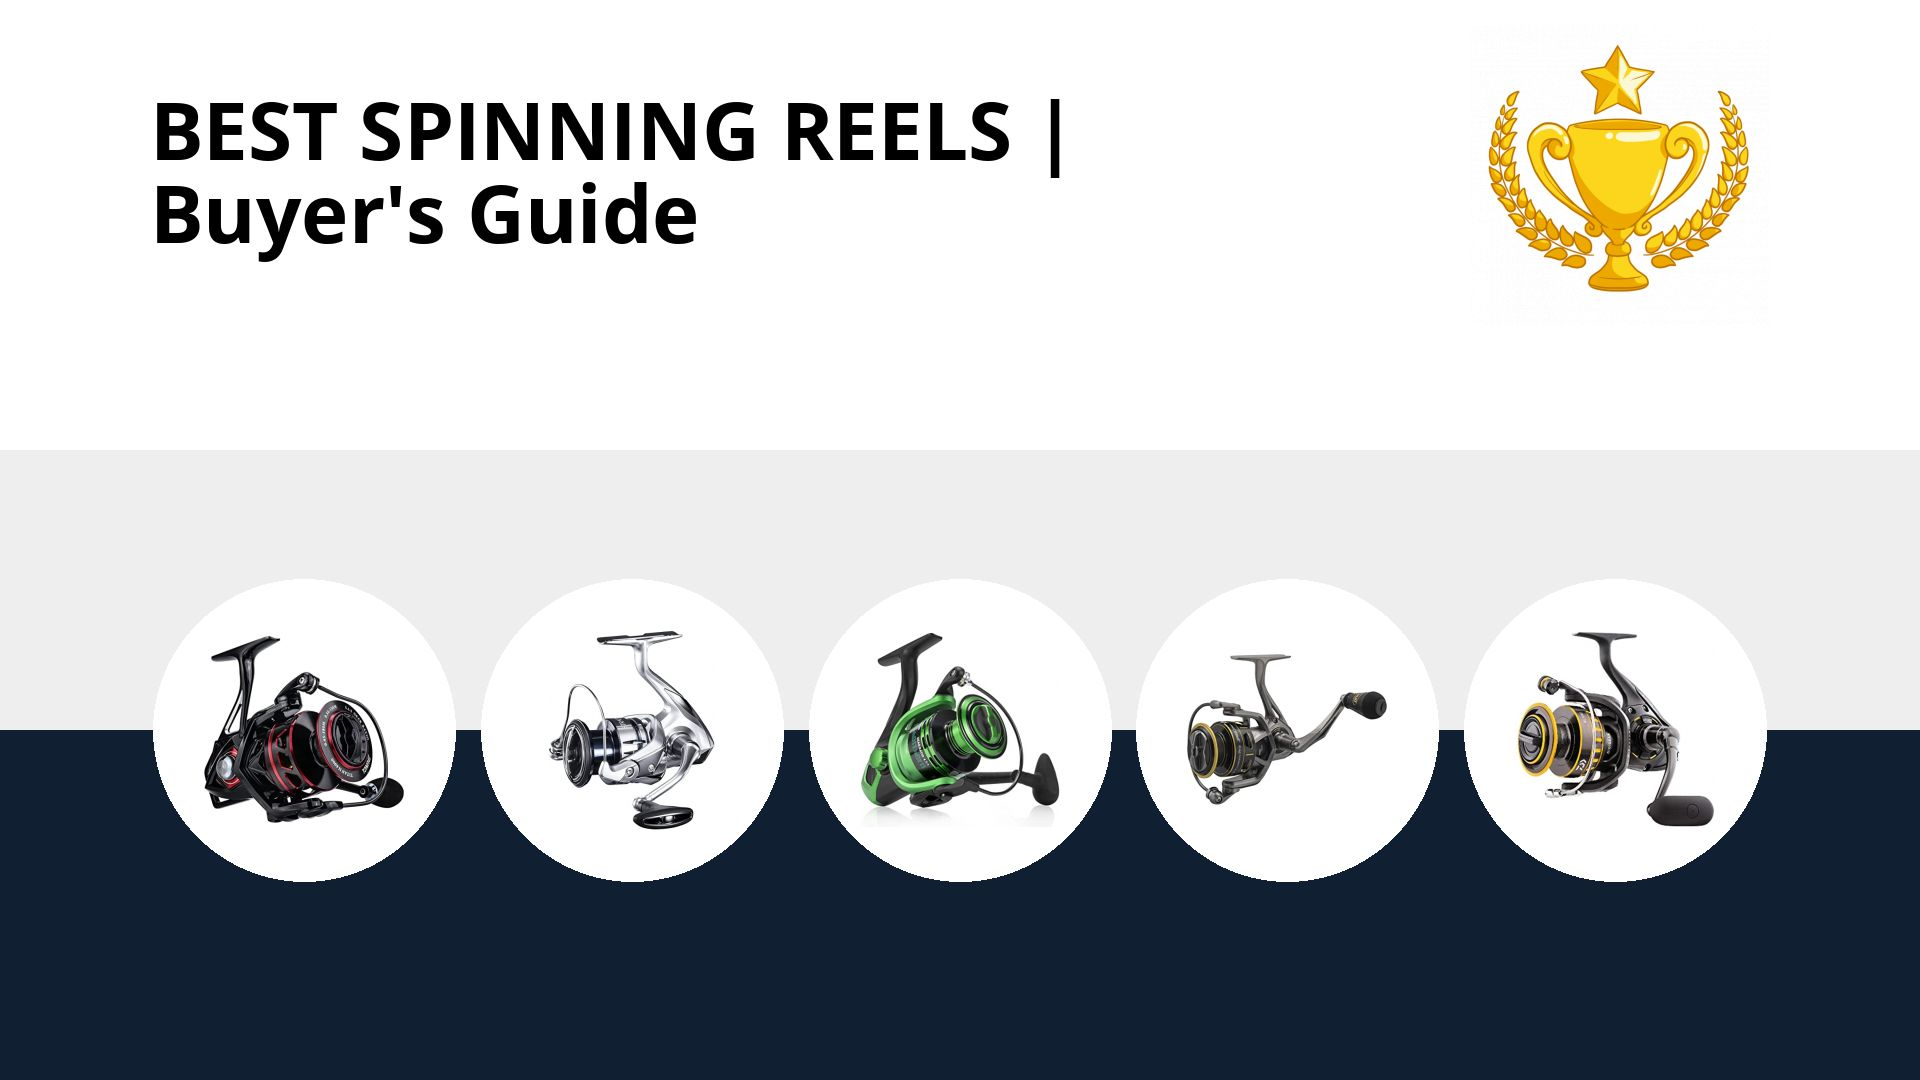 Best Spinning Reels: image